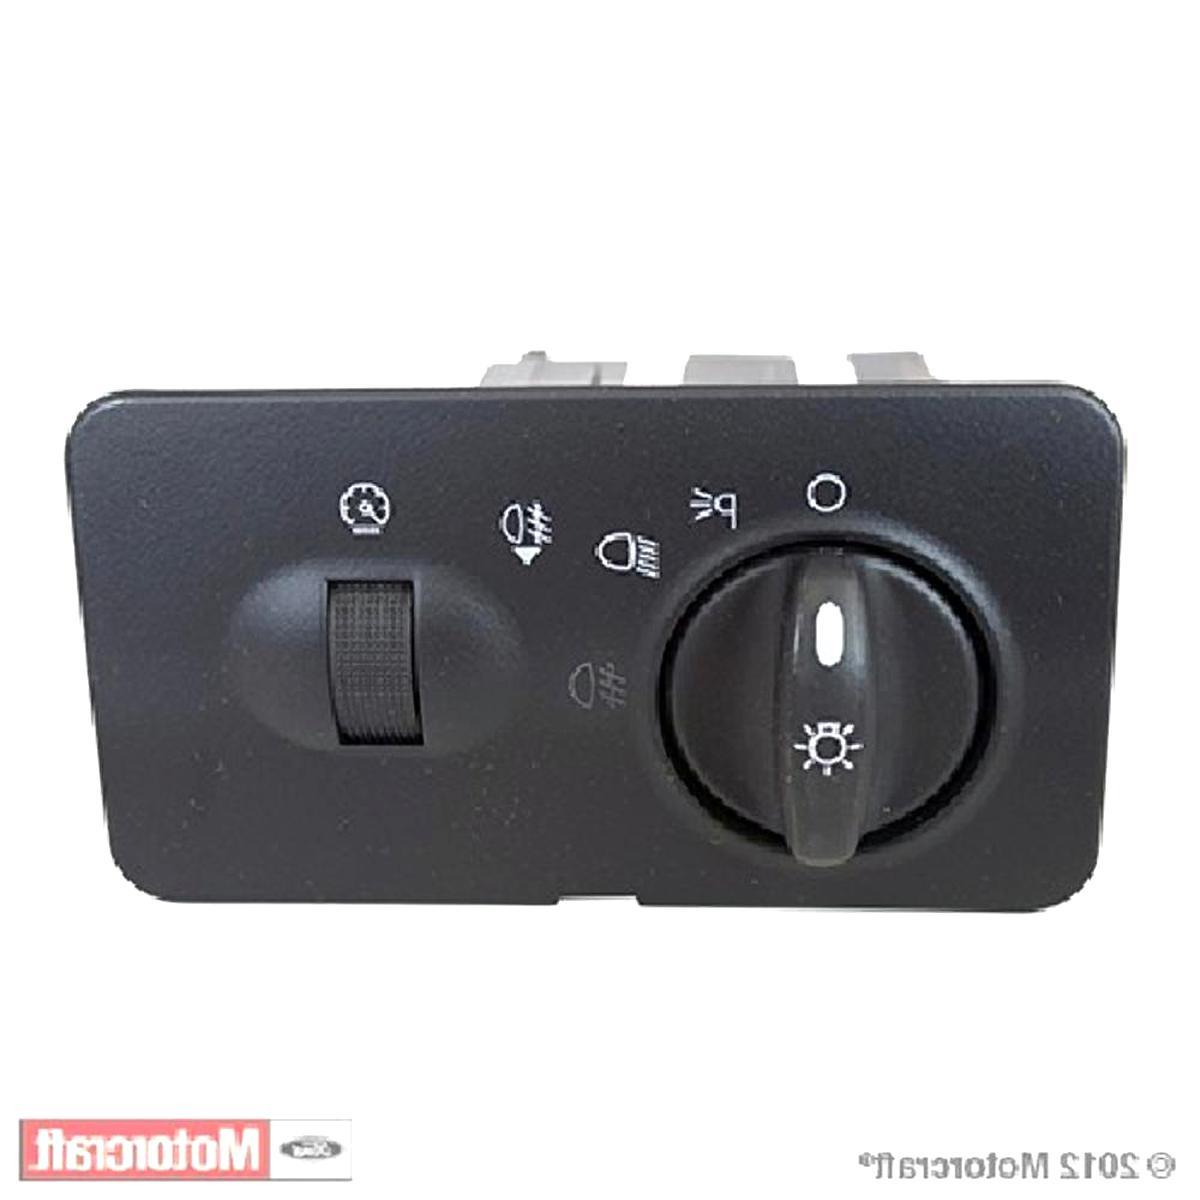 Motorcraft SW-6833 Headlamp Switch